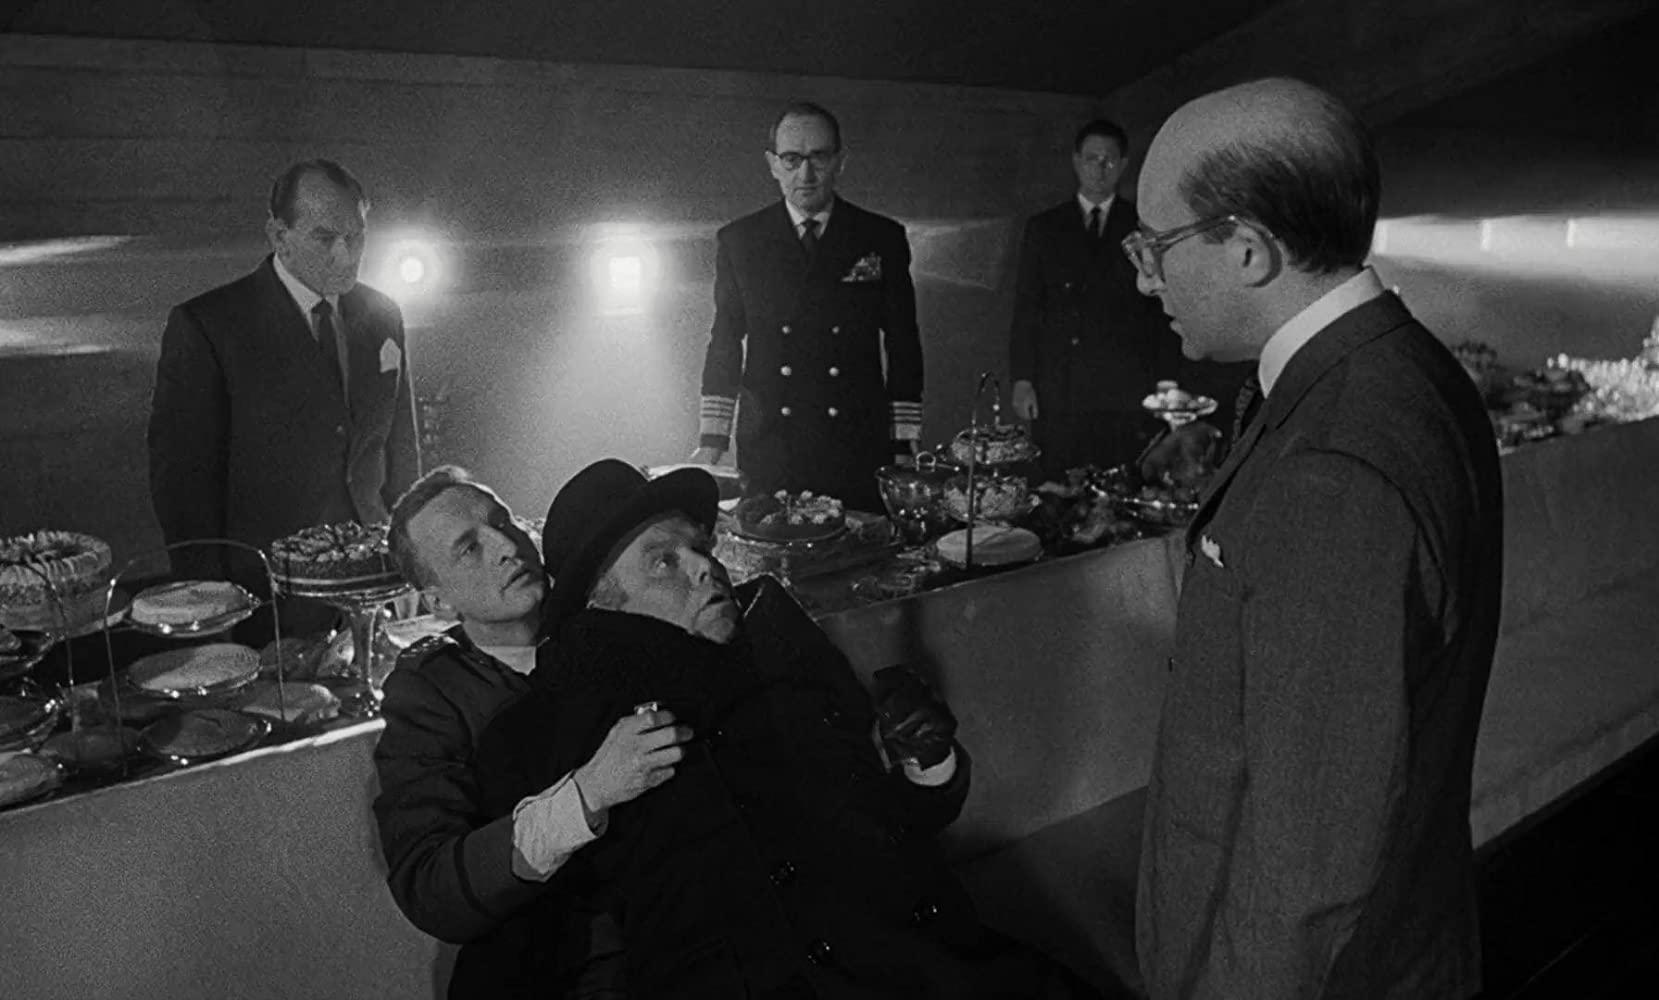 Peter SDellers in Stanley Kubrick's Dr. Strangelove